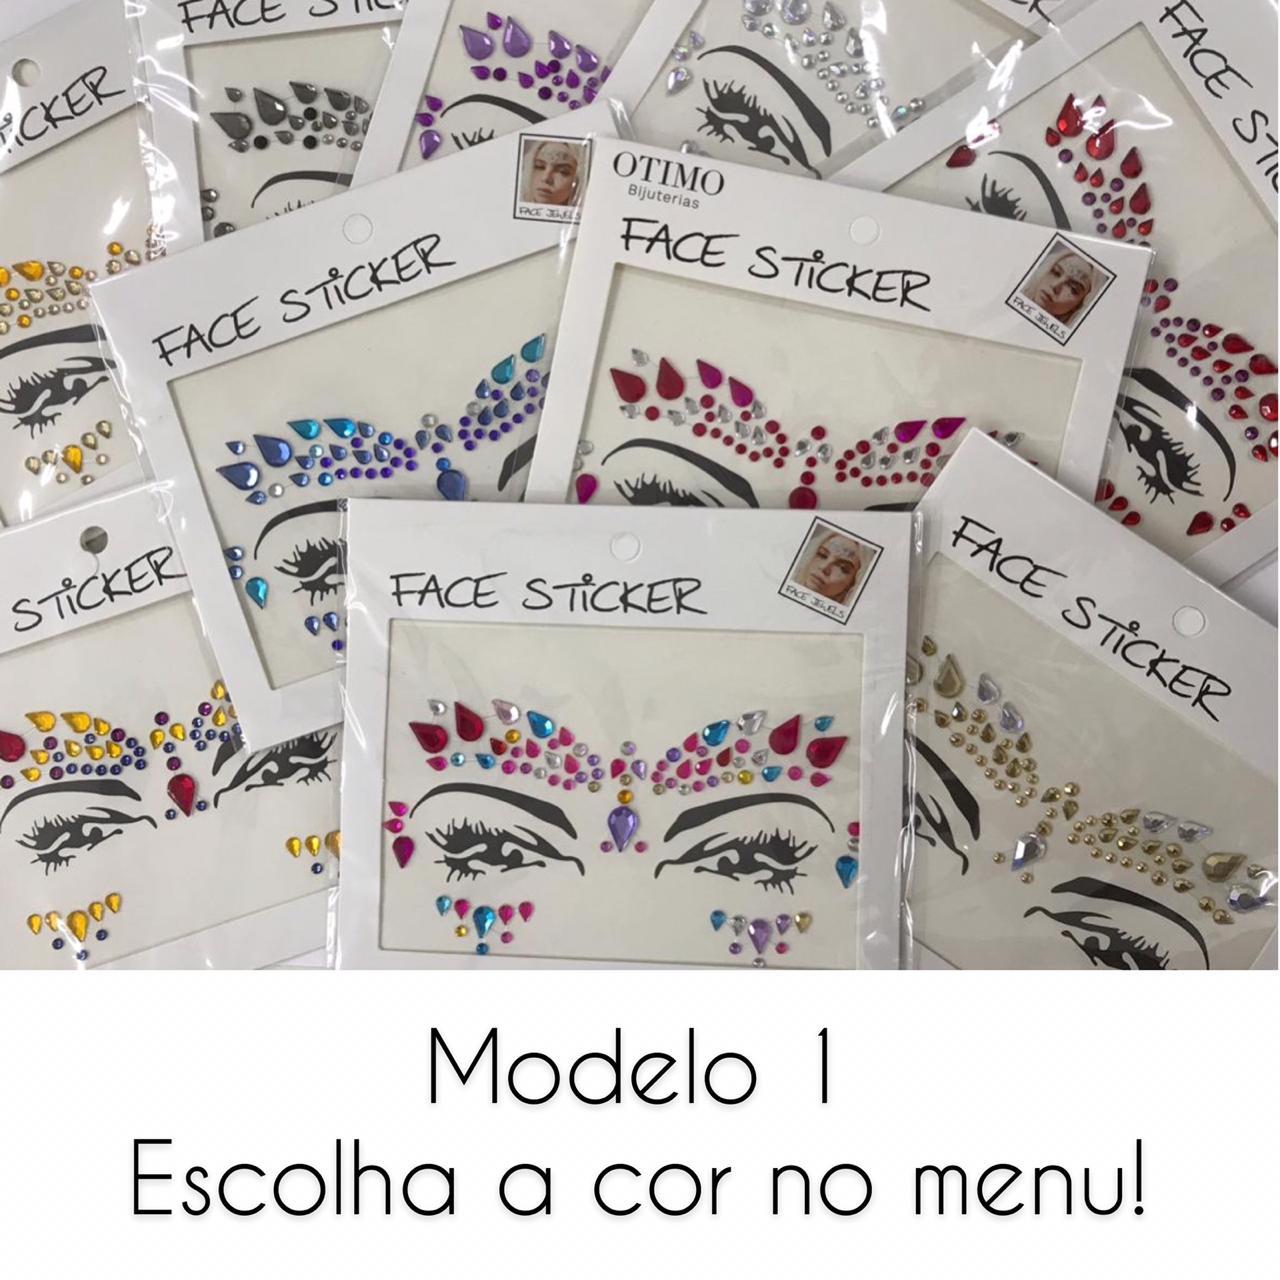 Face Sticker Carnaval Modelo 1